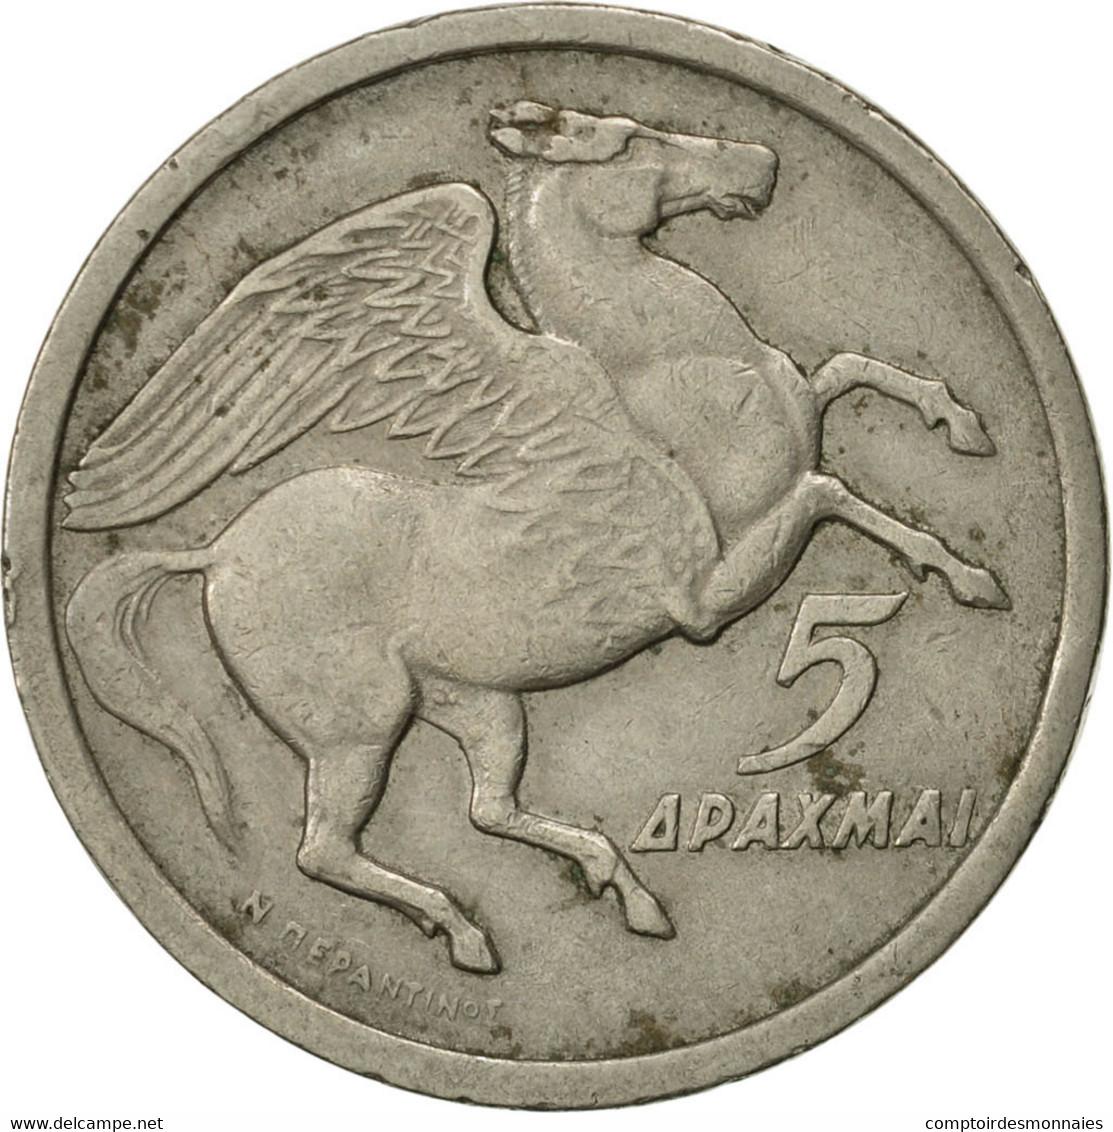 Grèce, 5 Drachmai, 1973, TTB, Copper-nickel, KM:109.1 - Grèce